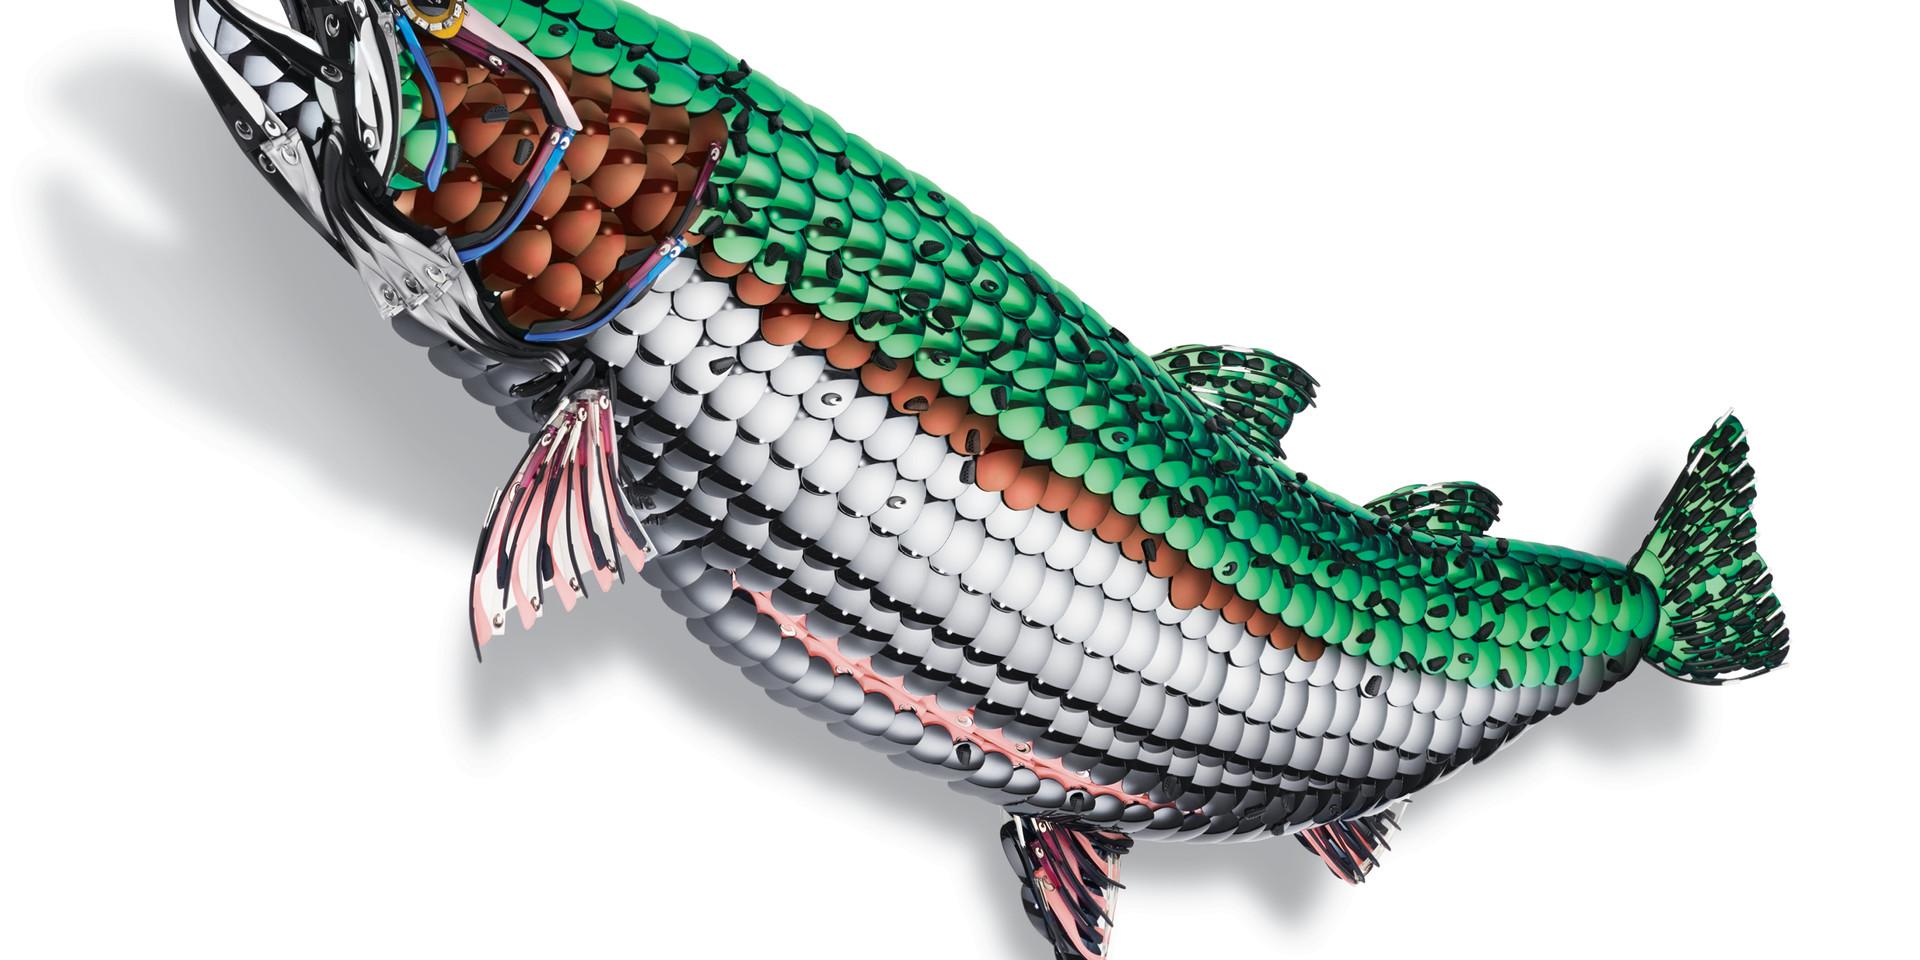 Costa Del Mar - Steelhead Bass